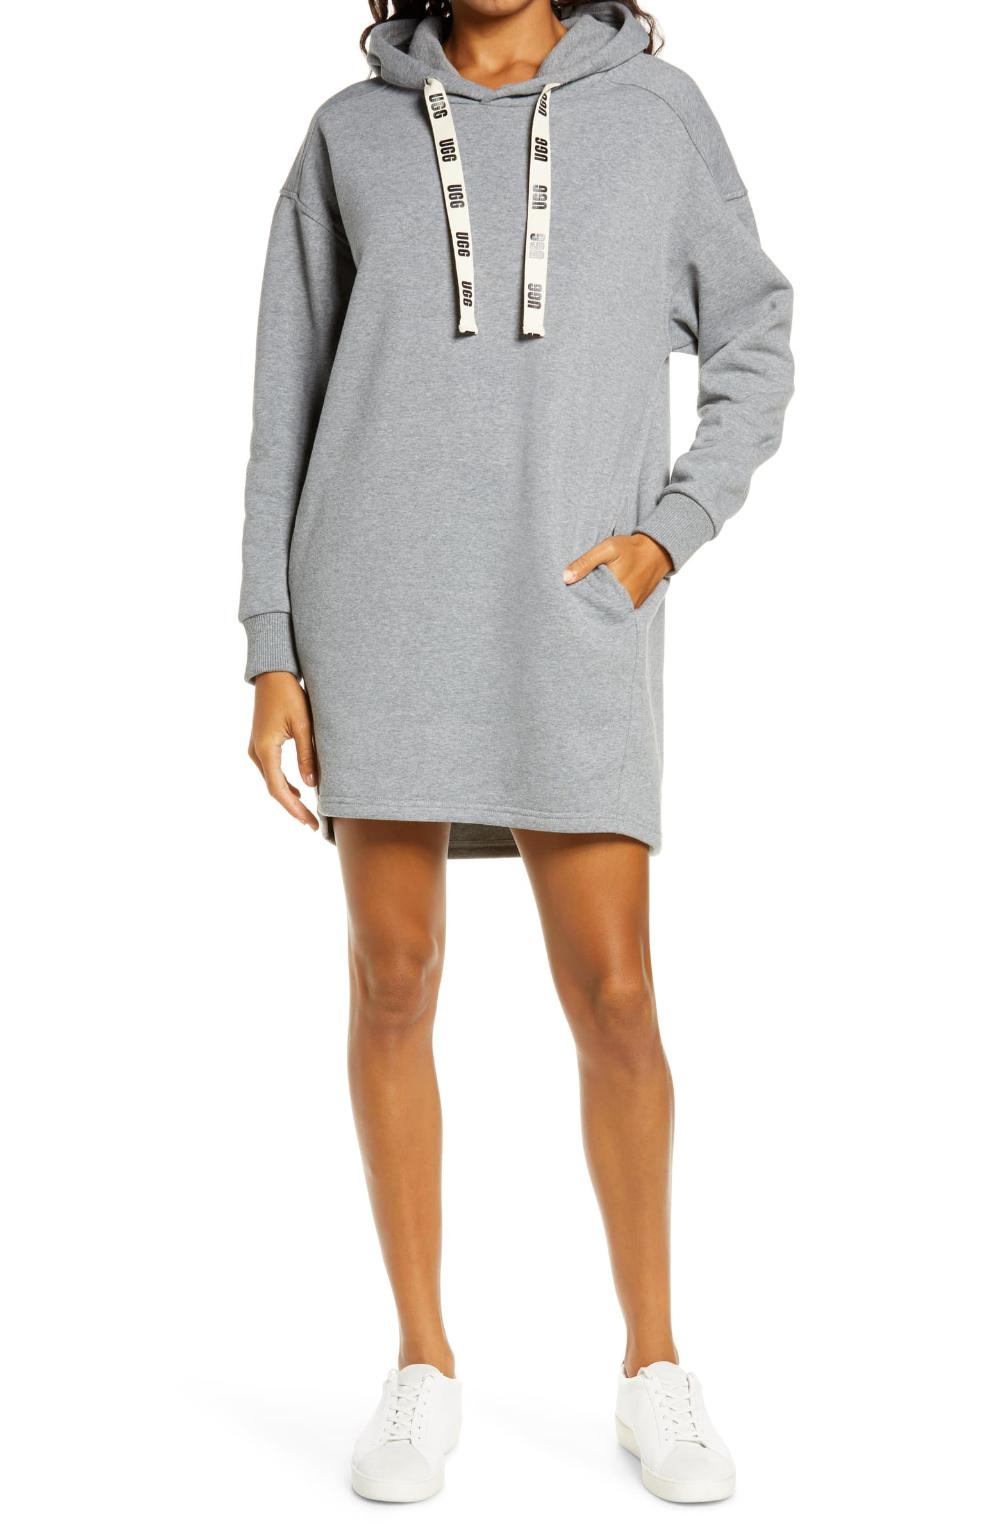 11++ Nordstrom sweatshirt dress ideas